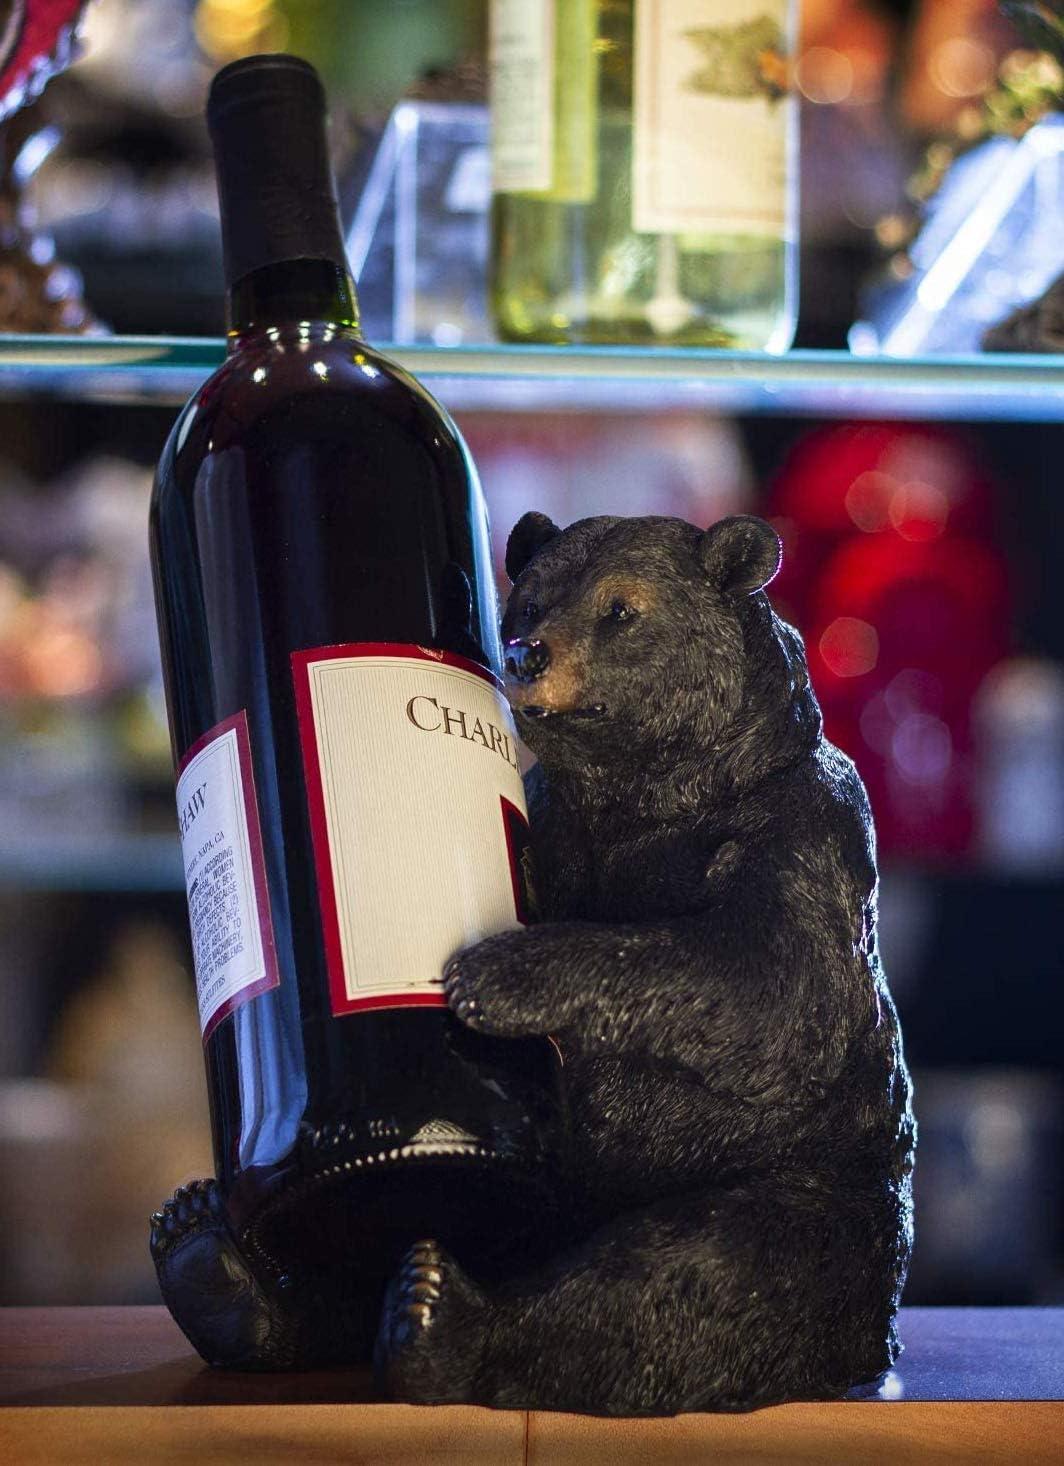 Ebros Rustic Cabin Lodge Decorative Sitting Black Bear Wine Bottle Holder Figurine 7.25